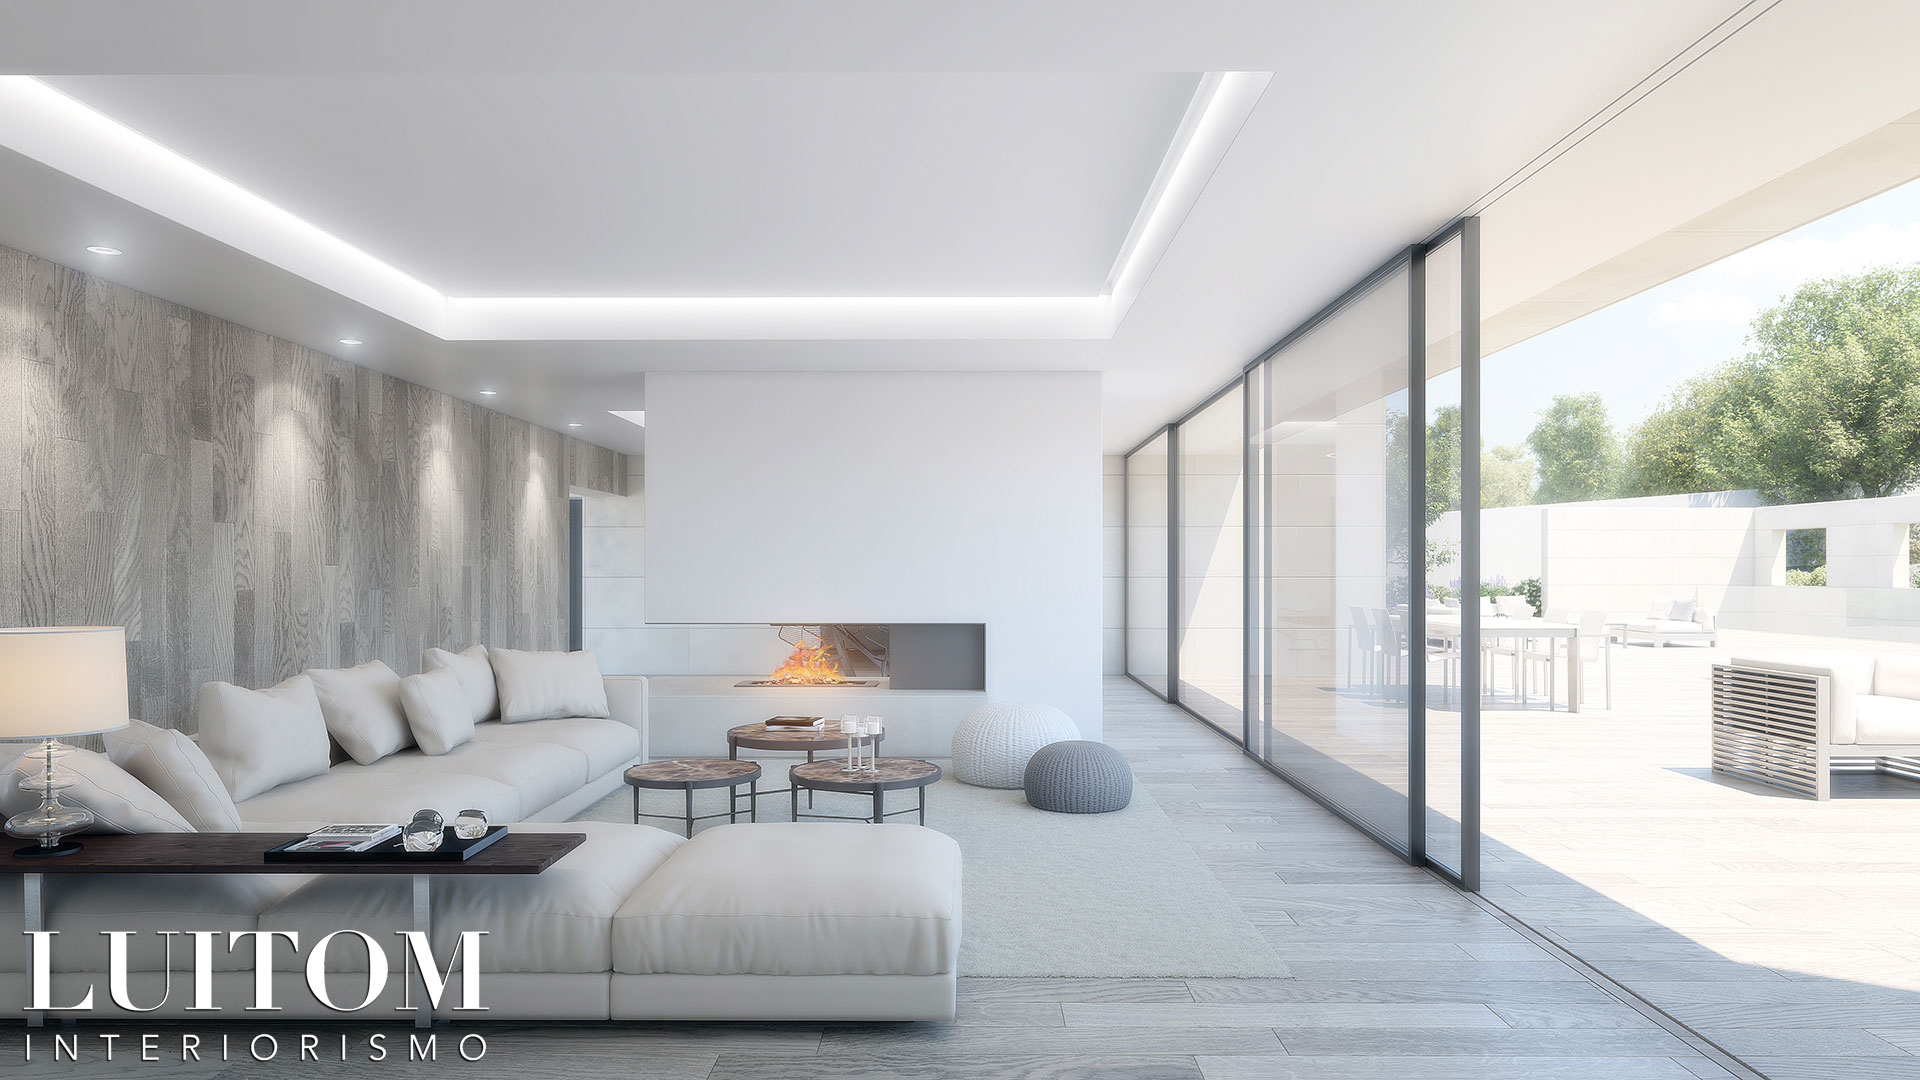 ideas-reformas-casas-lujo-interiorismo-decoracion-viviendas-luxury-home-living-kitchen-interior-design-49